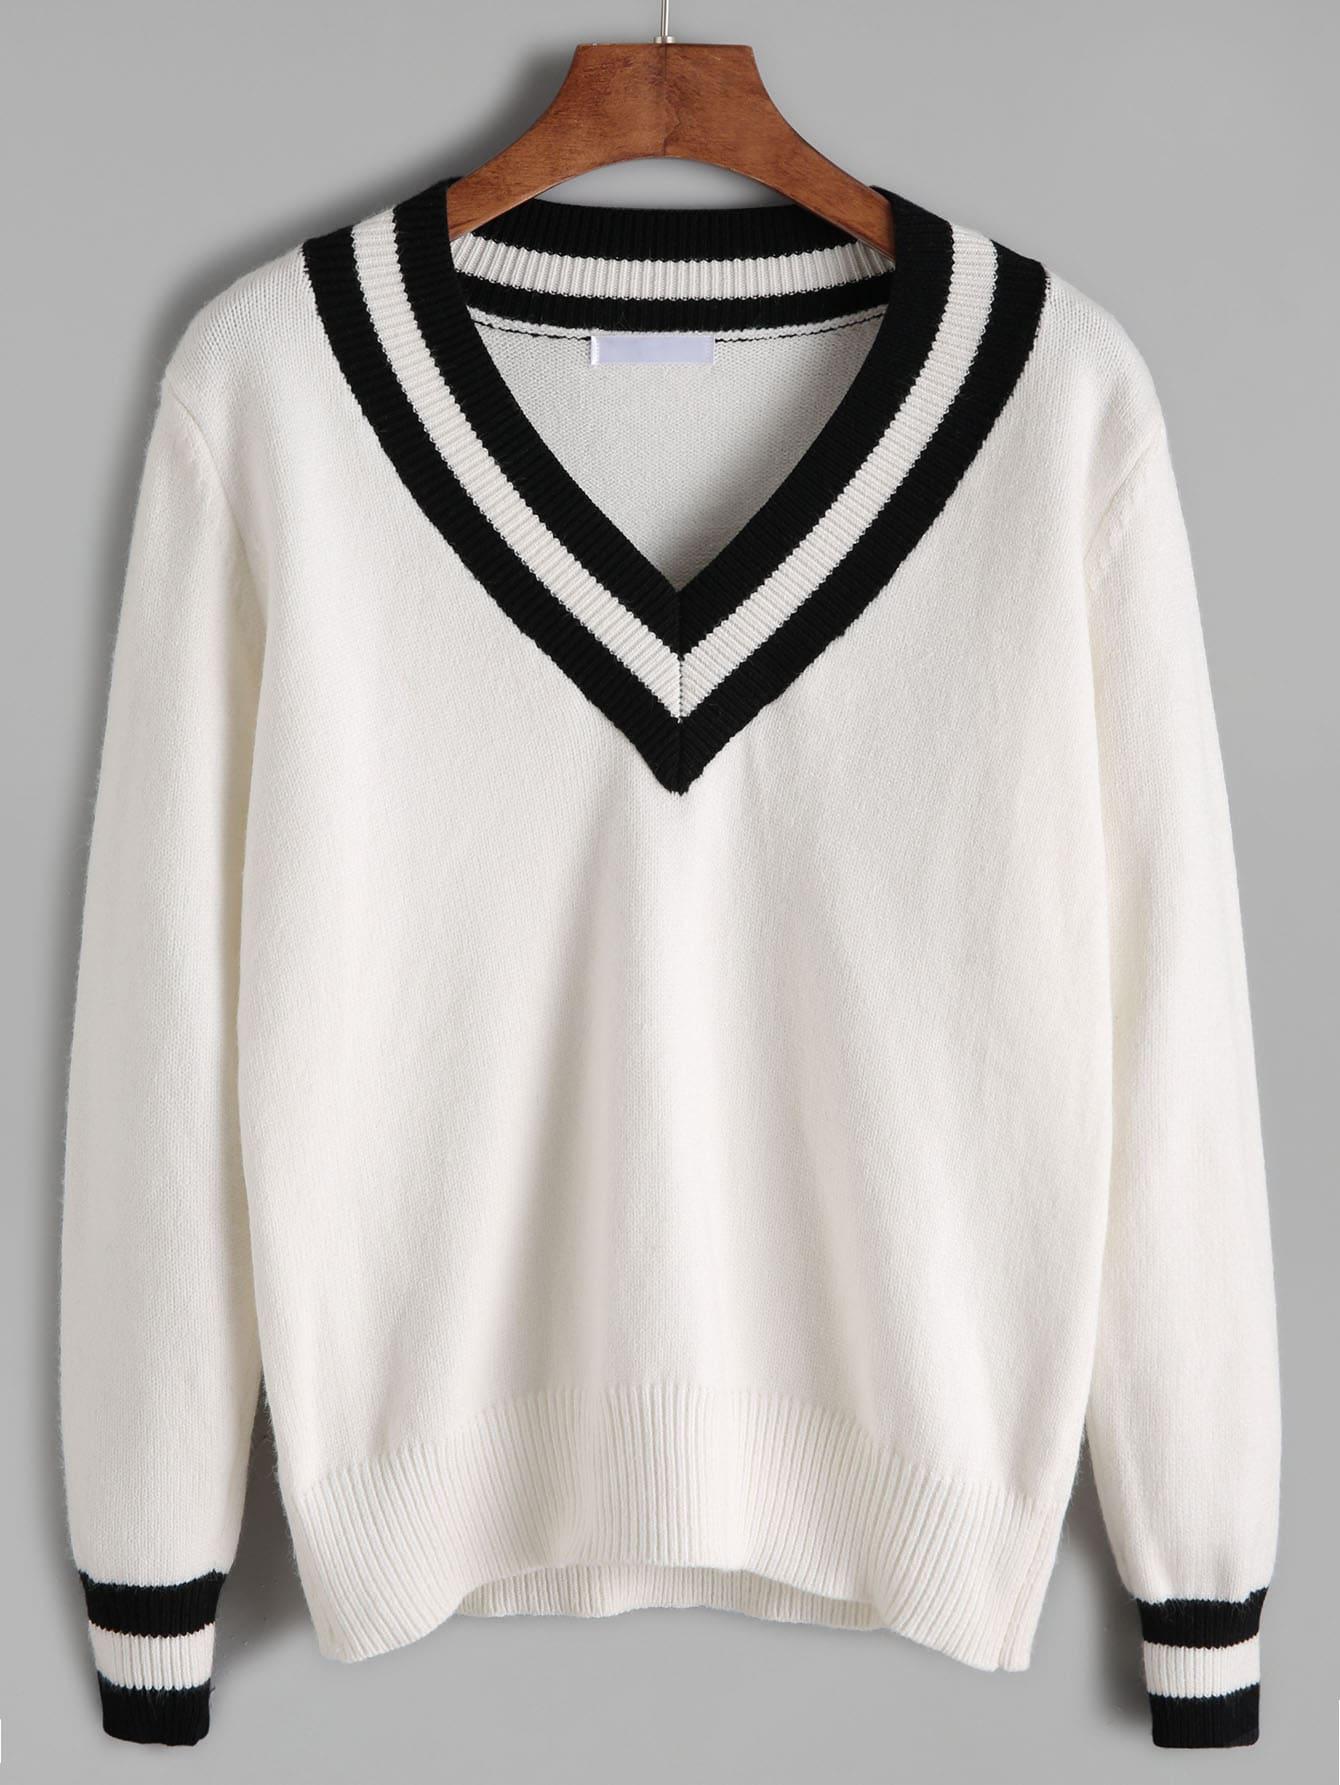 White Contrast Striped Trim Sweater sweater161005412